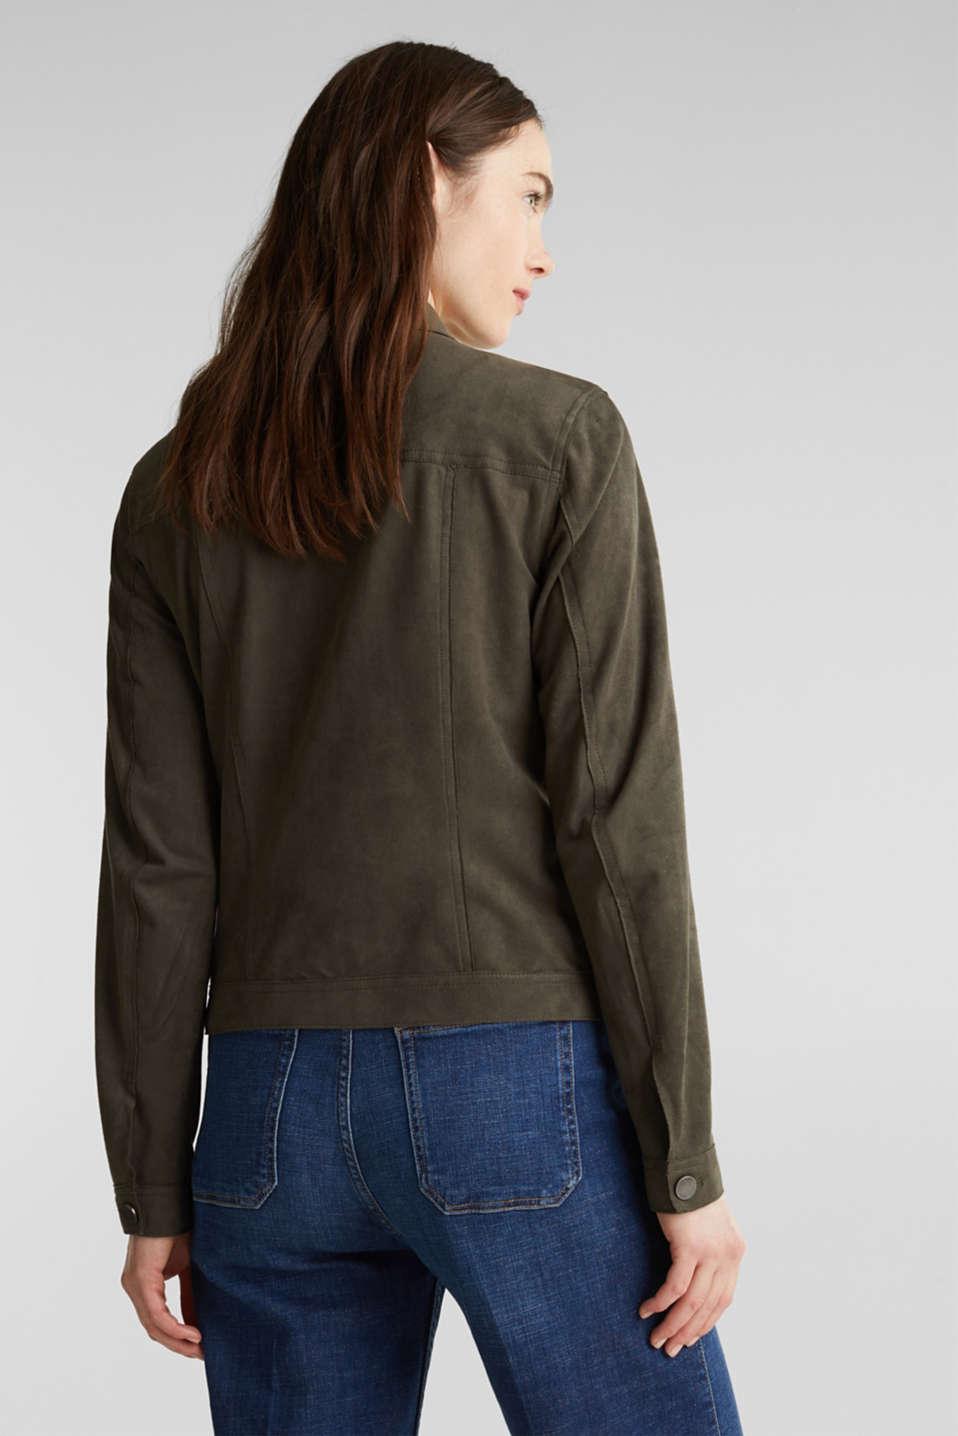 Soft faux suede jacket, KHAKI GREEN, detail image number 3